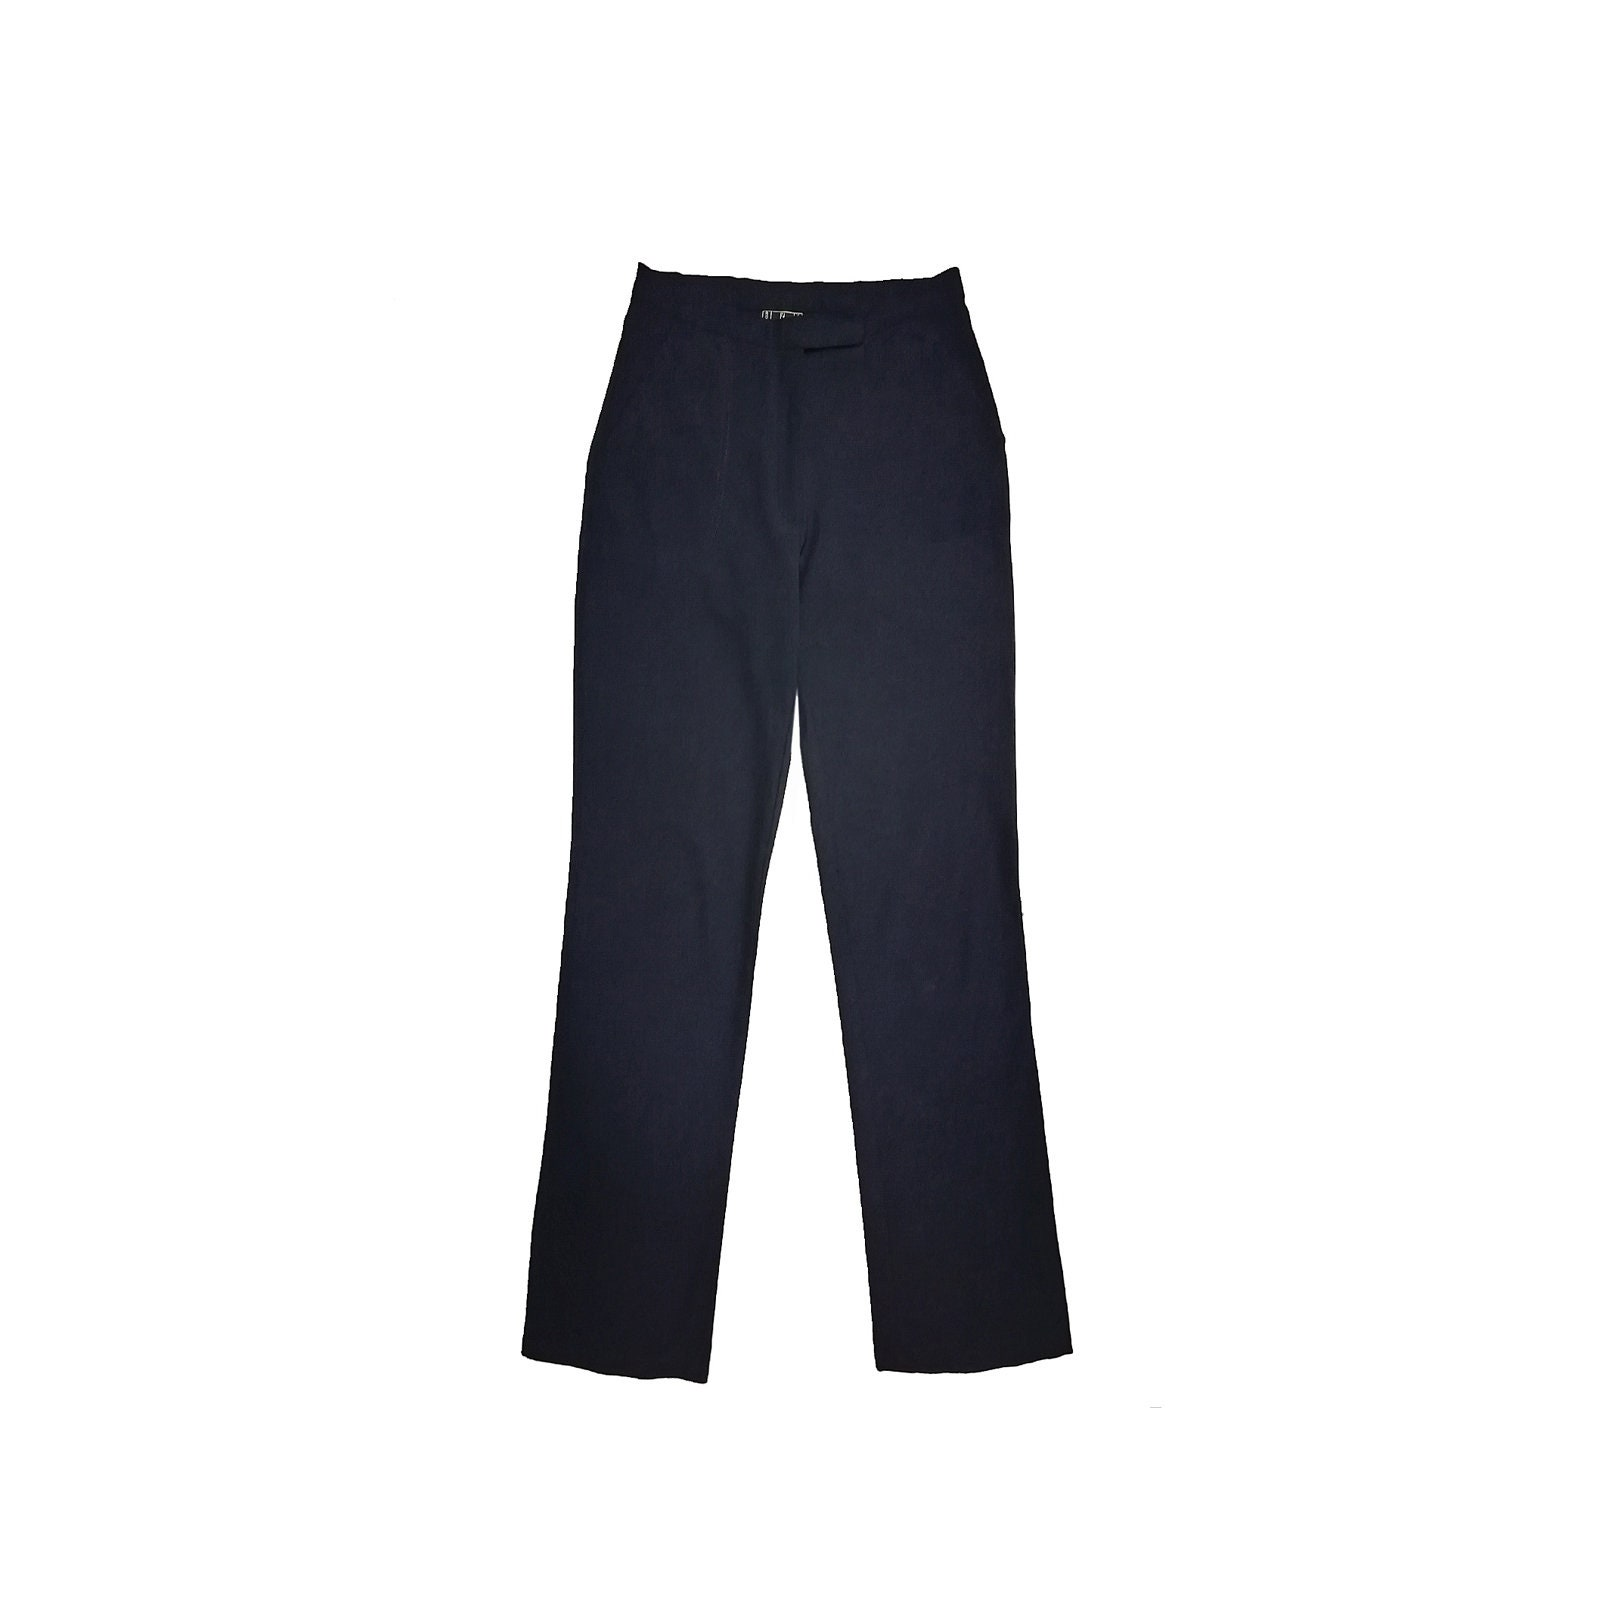 74258dc3eb FENDI jeans trousers black size M 30 44 suit pants pantaloni | Etsy